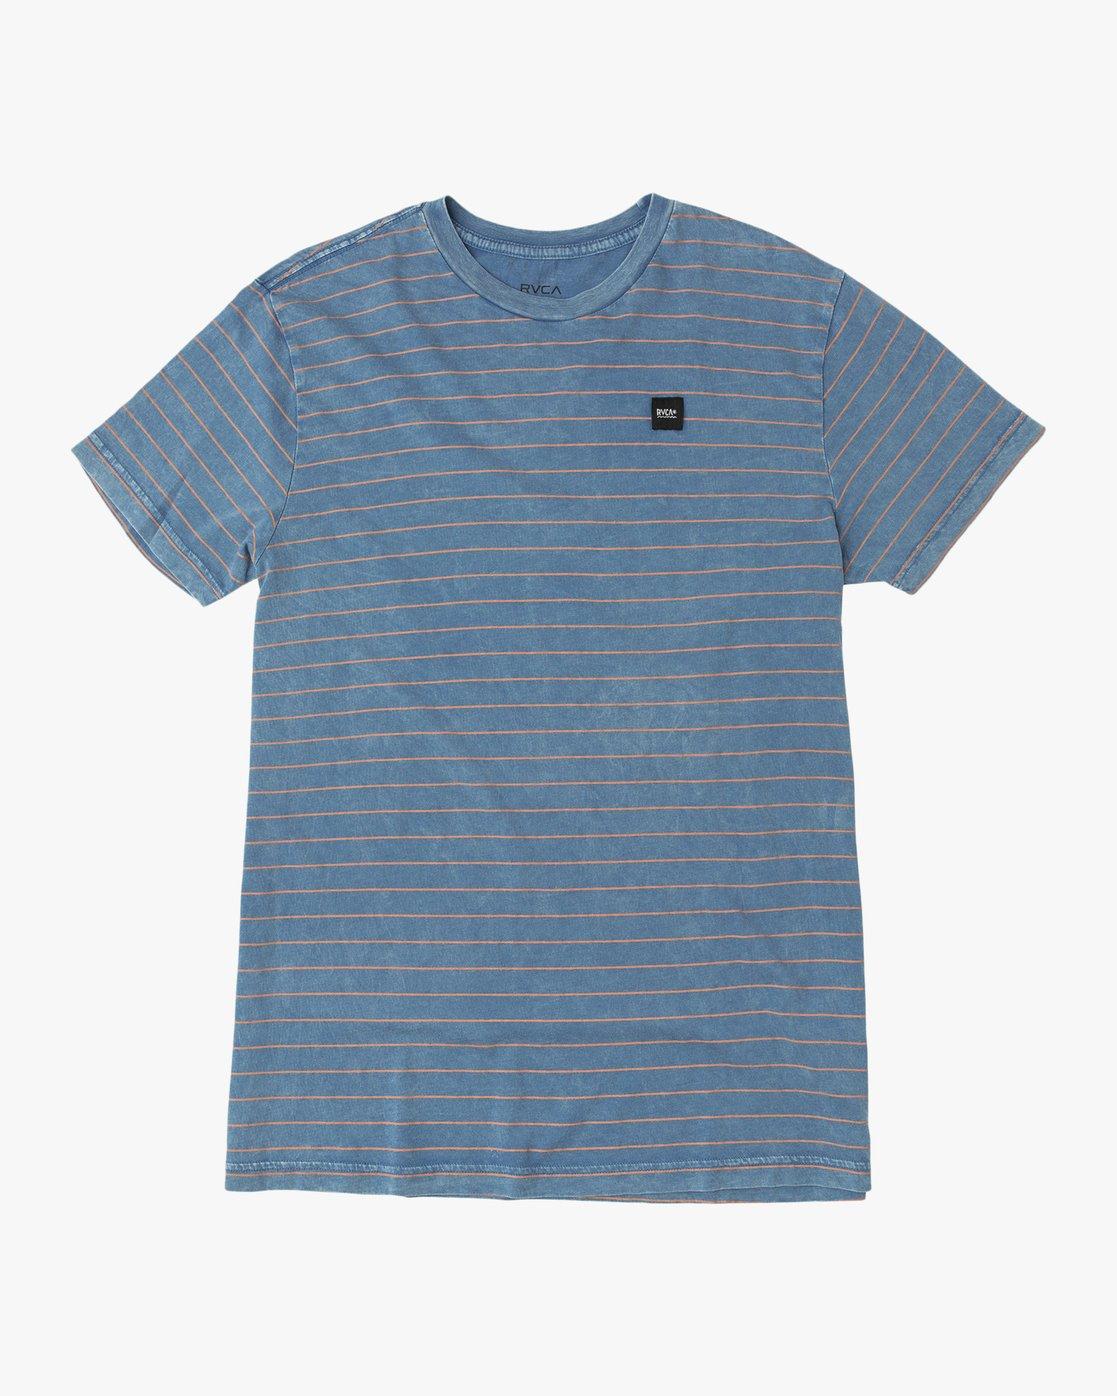 e81bd87505 0 Washout Striped Shirt M910NRWA RVCA